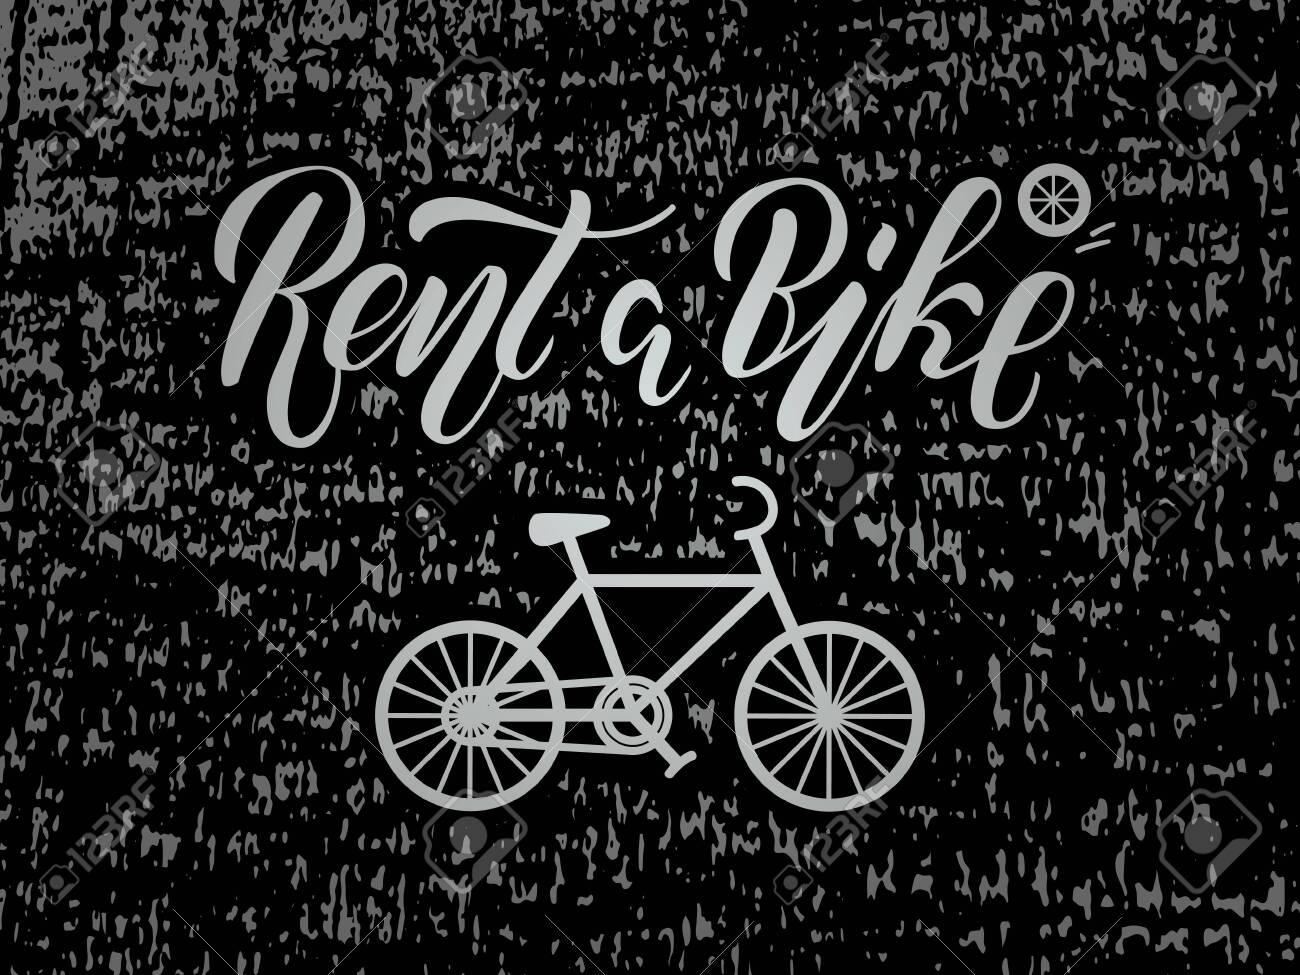 Vector illustration of rent a bike brush lettering for banner, leaflet, poster, clothes, logo, advertisement design. Handwritten text for template, signage, billboard, printing, price list, flyer - 137531340